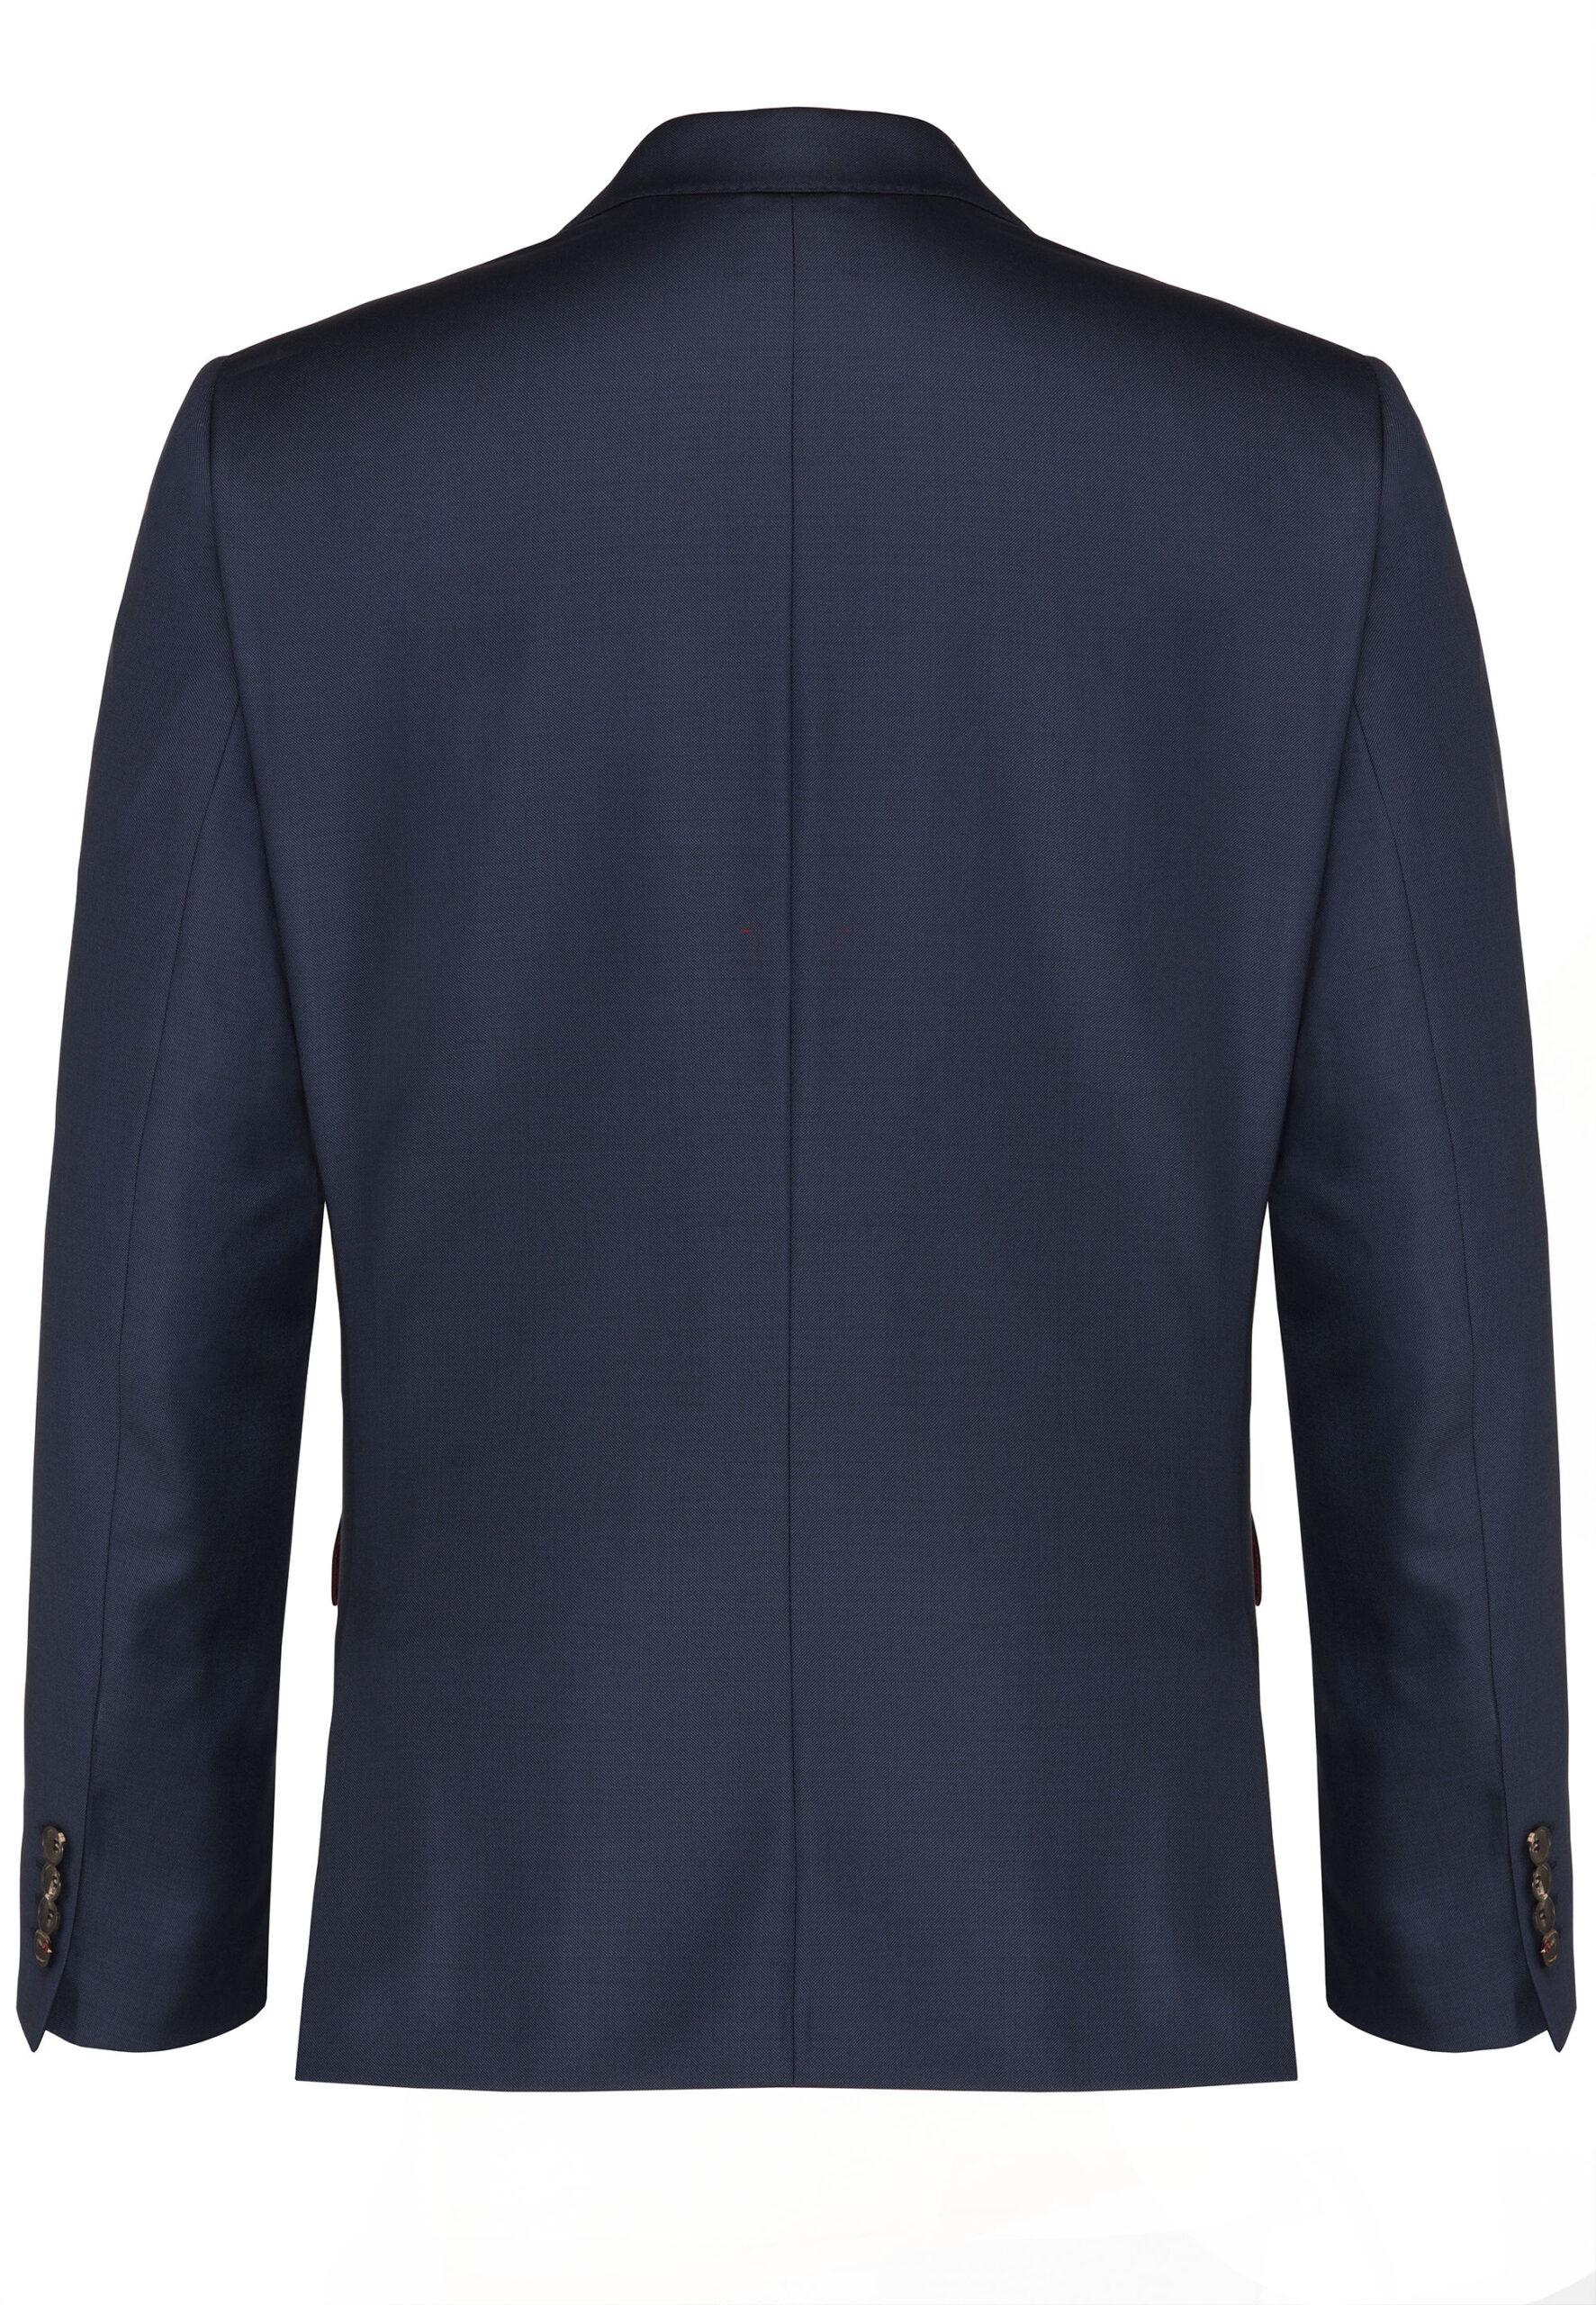 40-016N0-63 Savile Row jas achter